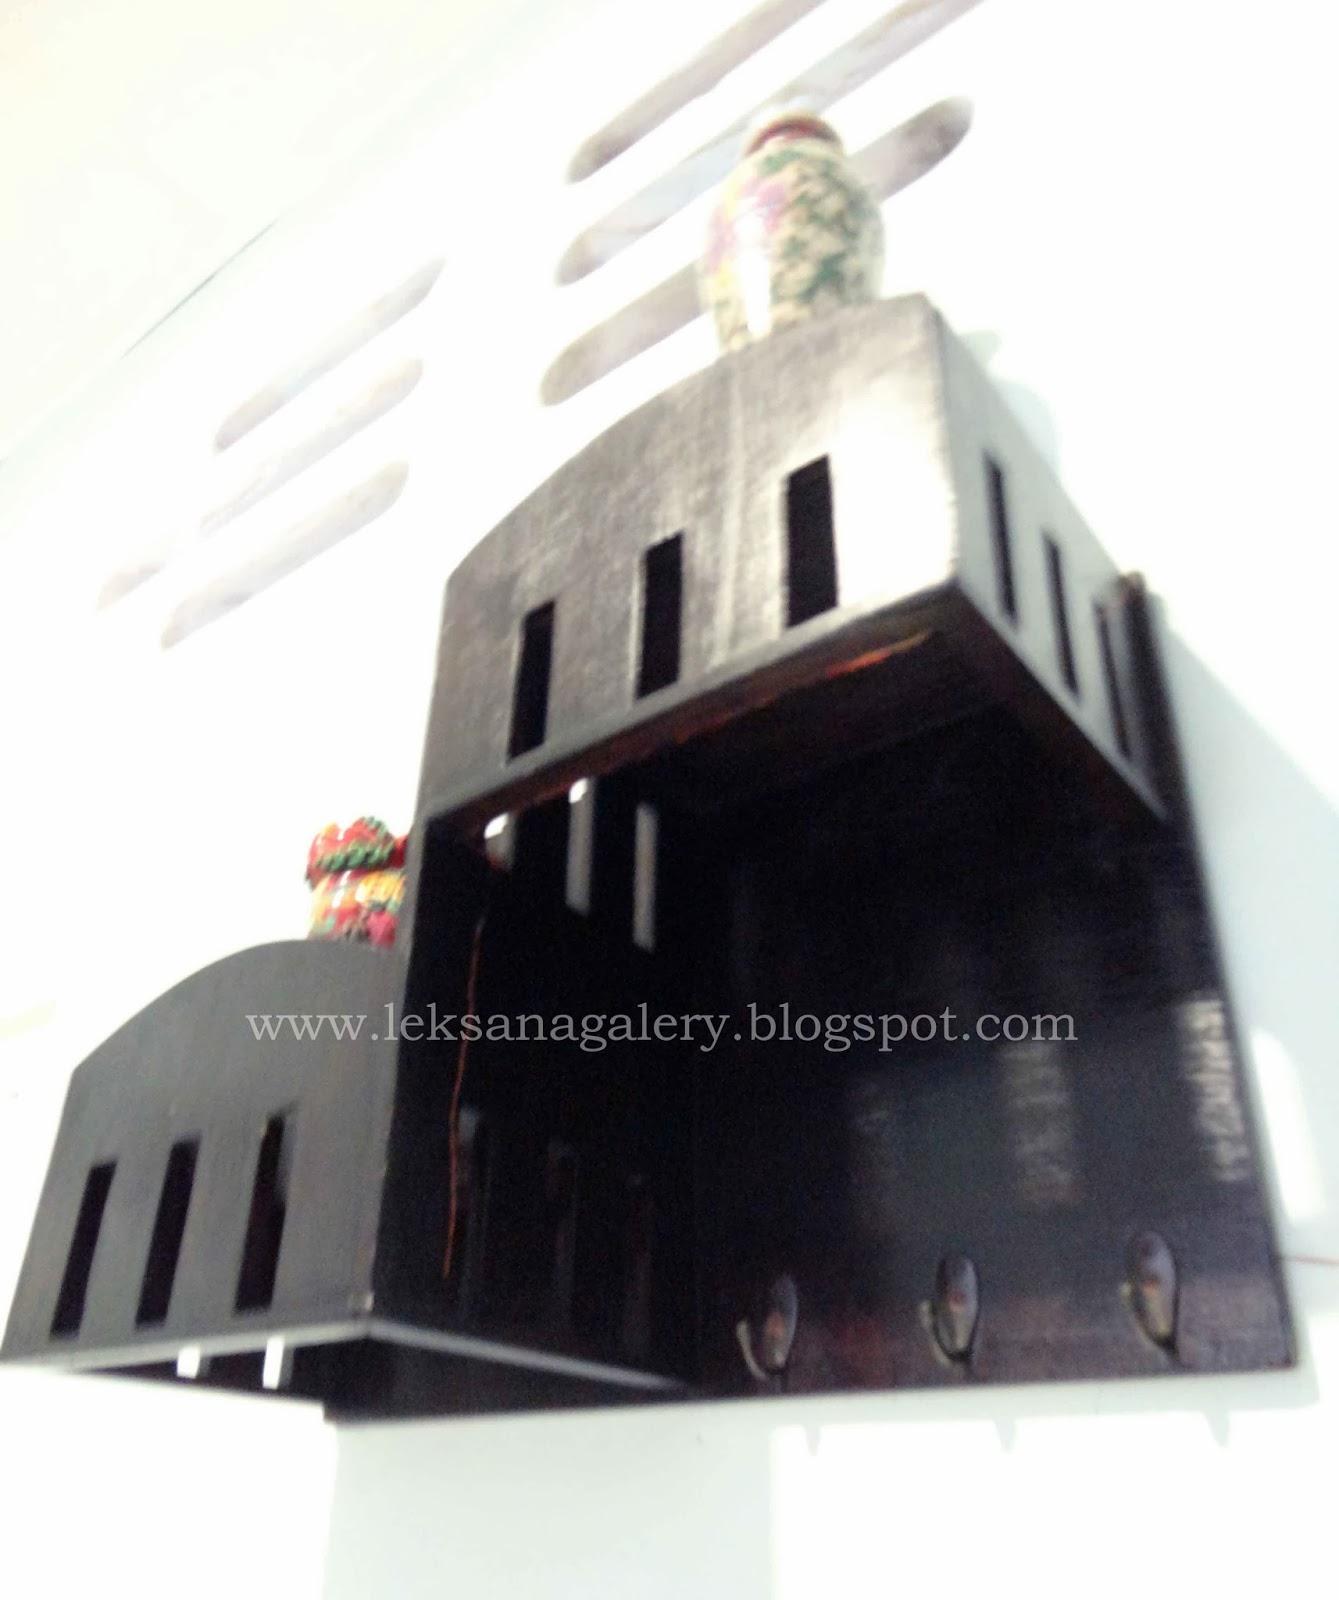 Esprit Art Deco Com leksana gallery : kapstok/tempat kunci art deco